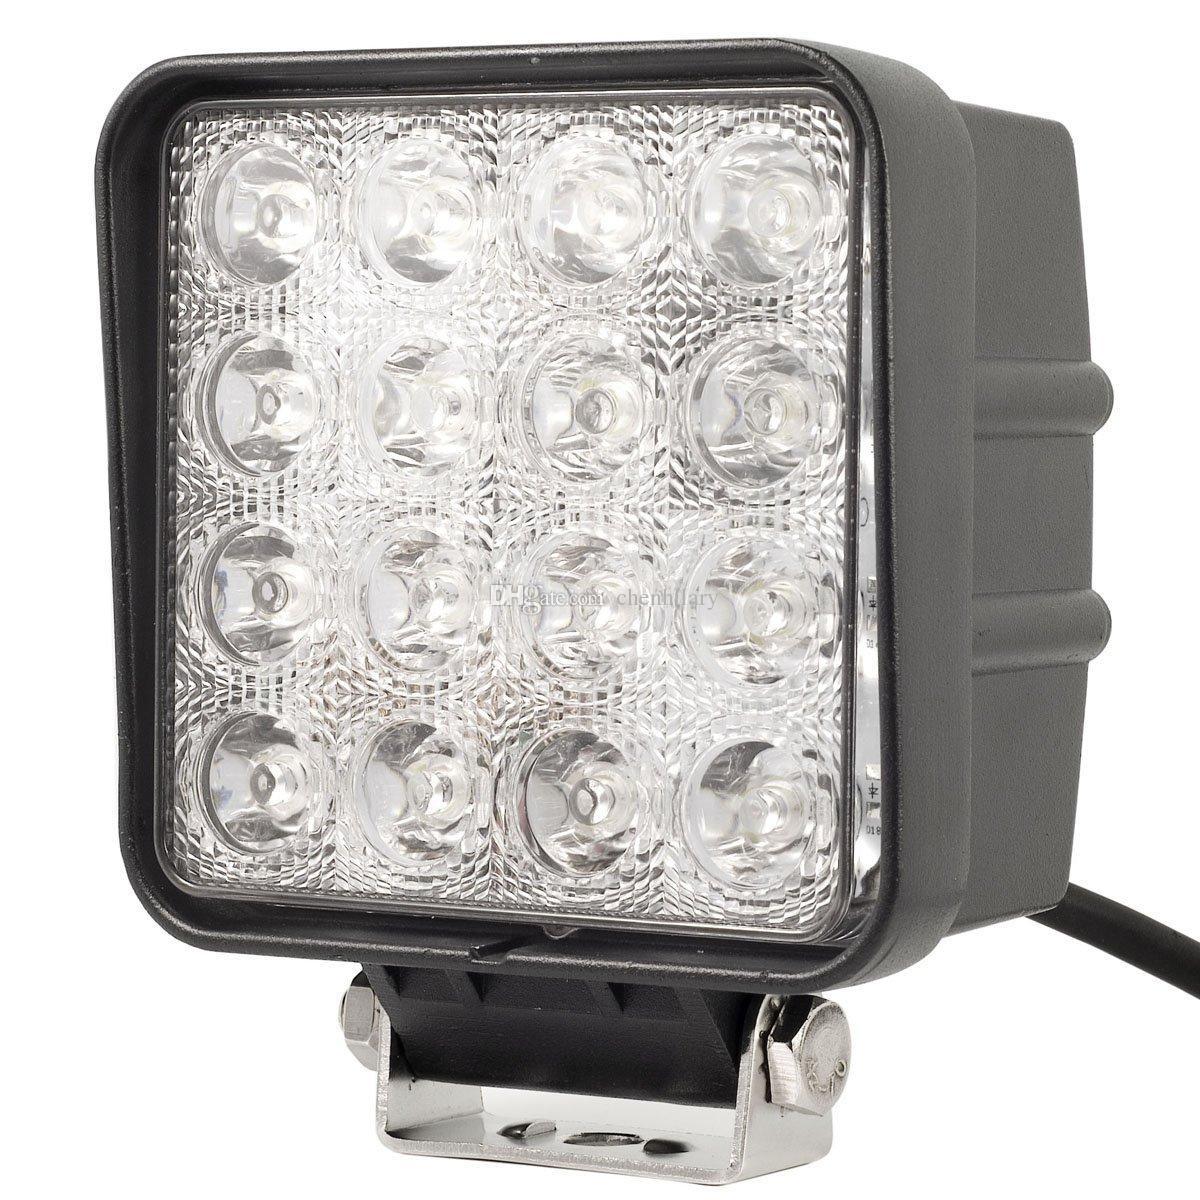 Sprzedaż promocja! 4.5 cal 48W LED Light Light 12 V 24 V Powódź wiązki Spot LED Light Light for Off Drogowe Użycie LED Lights For Ciężarówki